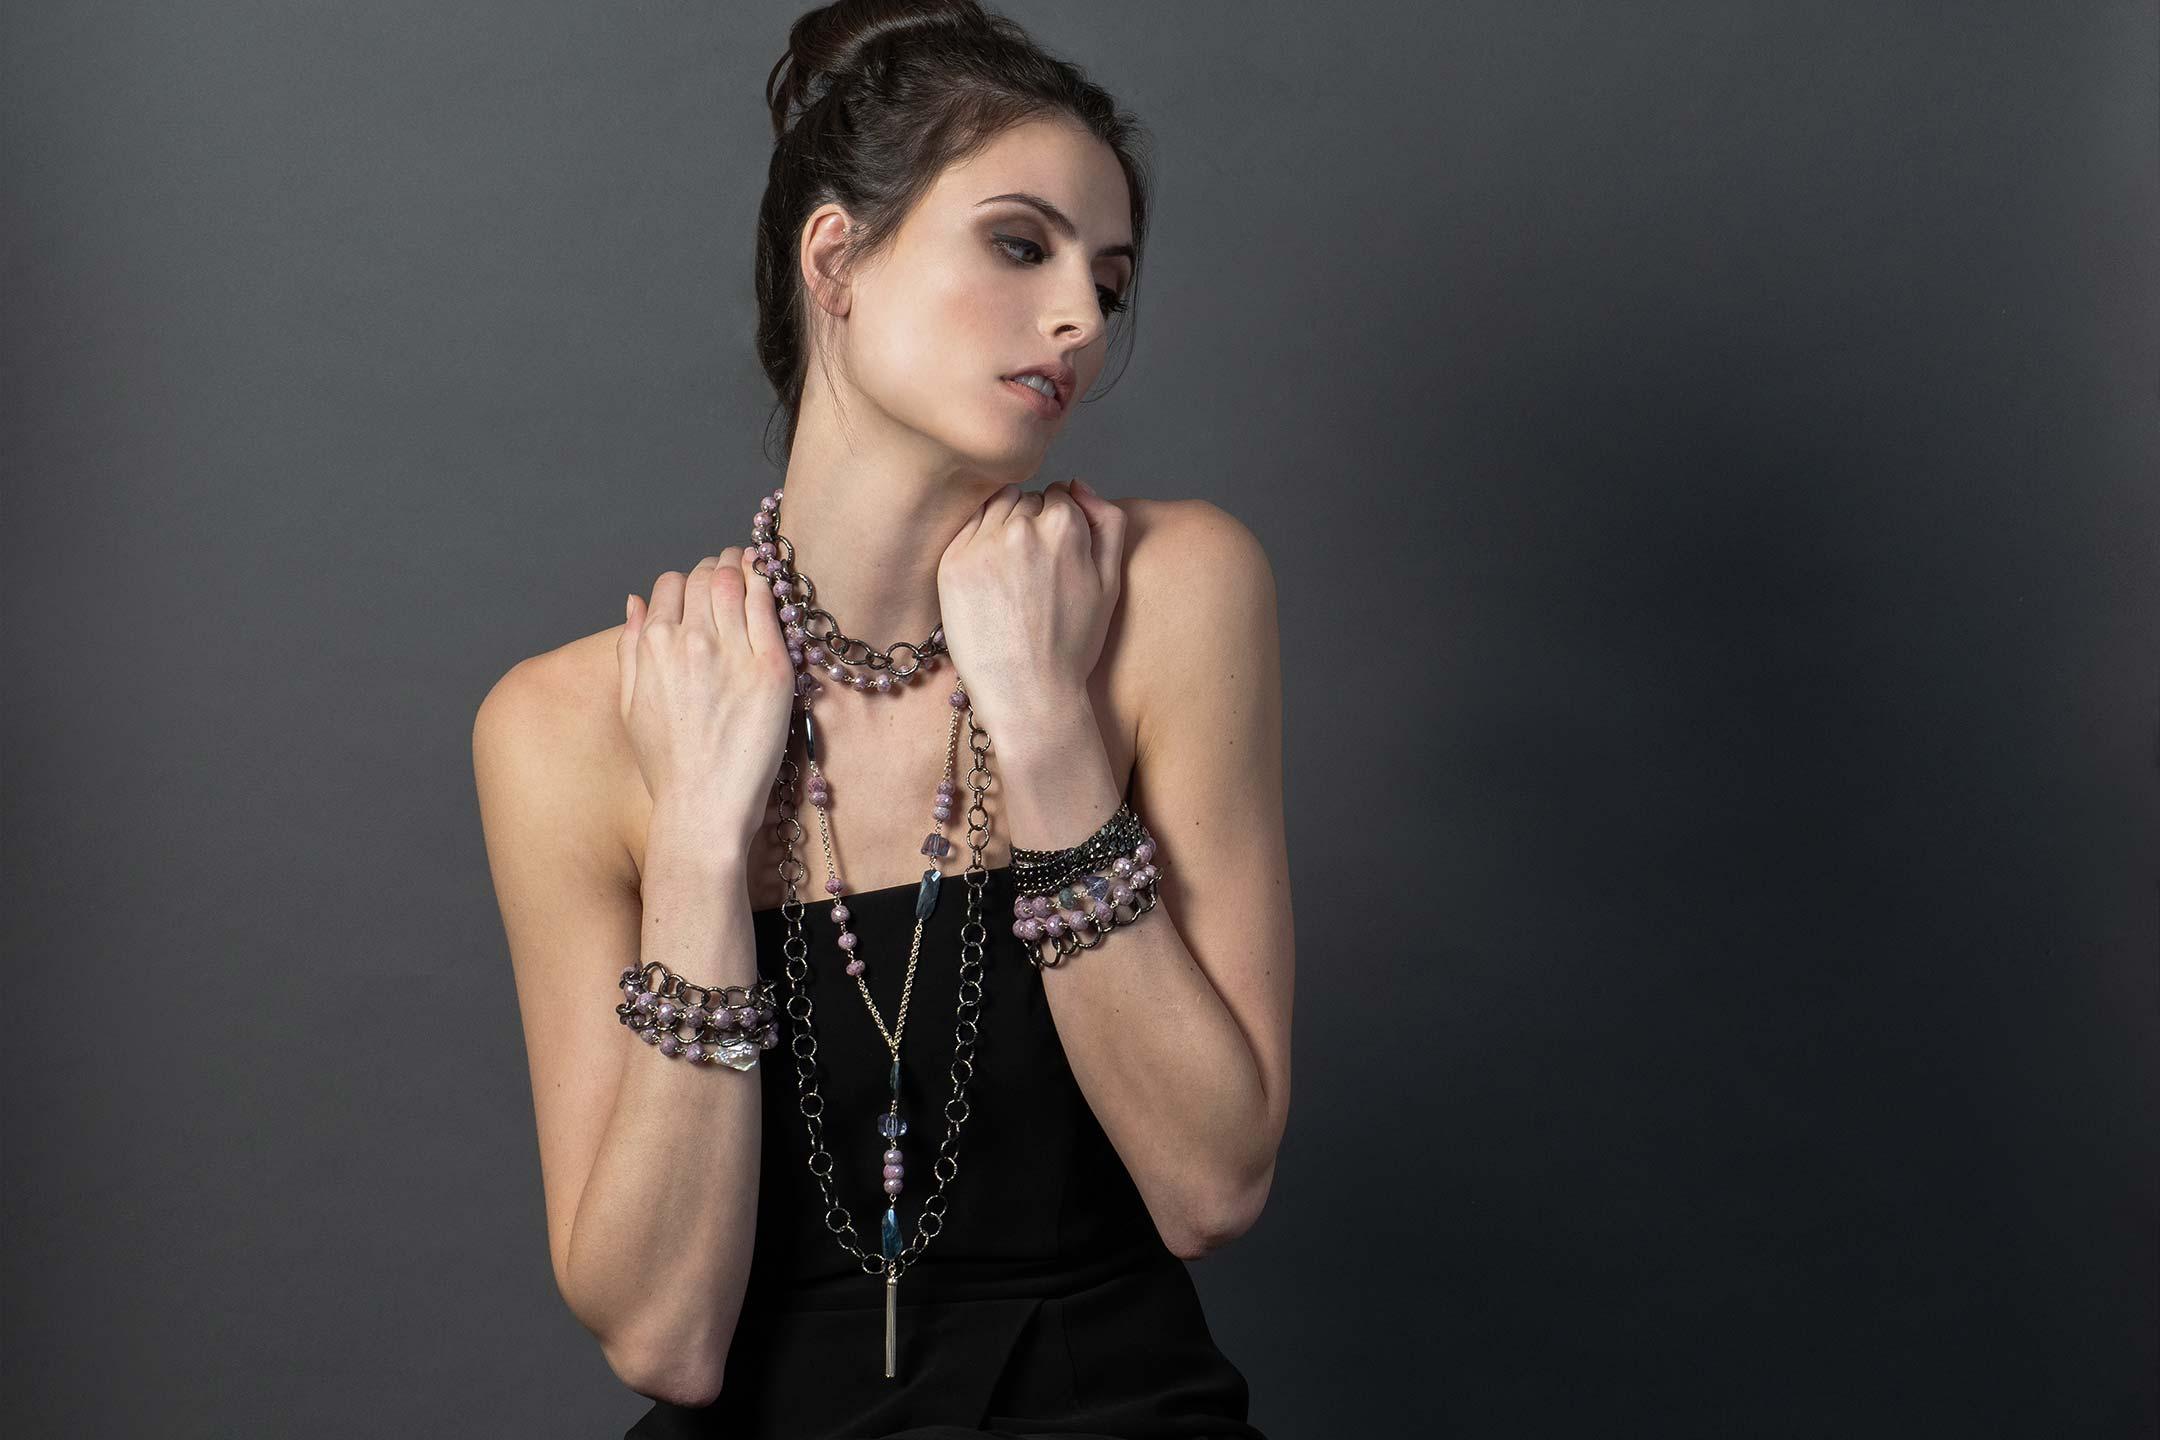 gm-debgasp-rotate-bracelets.jpg